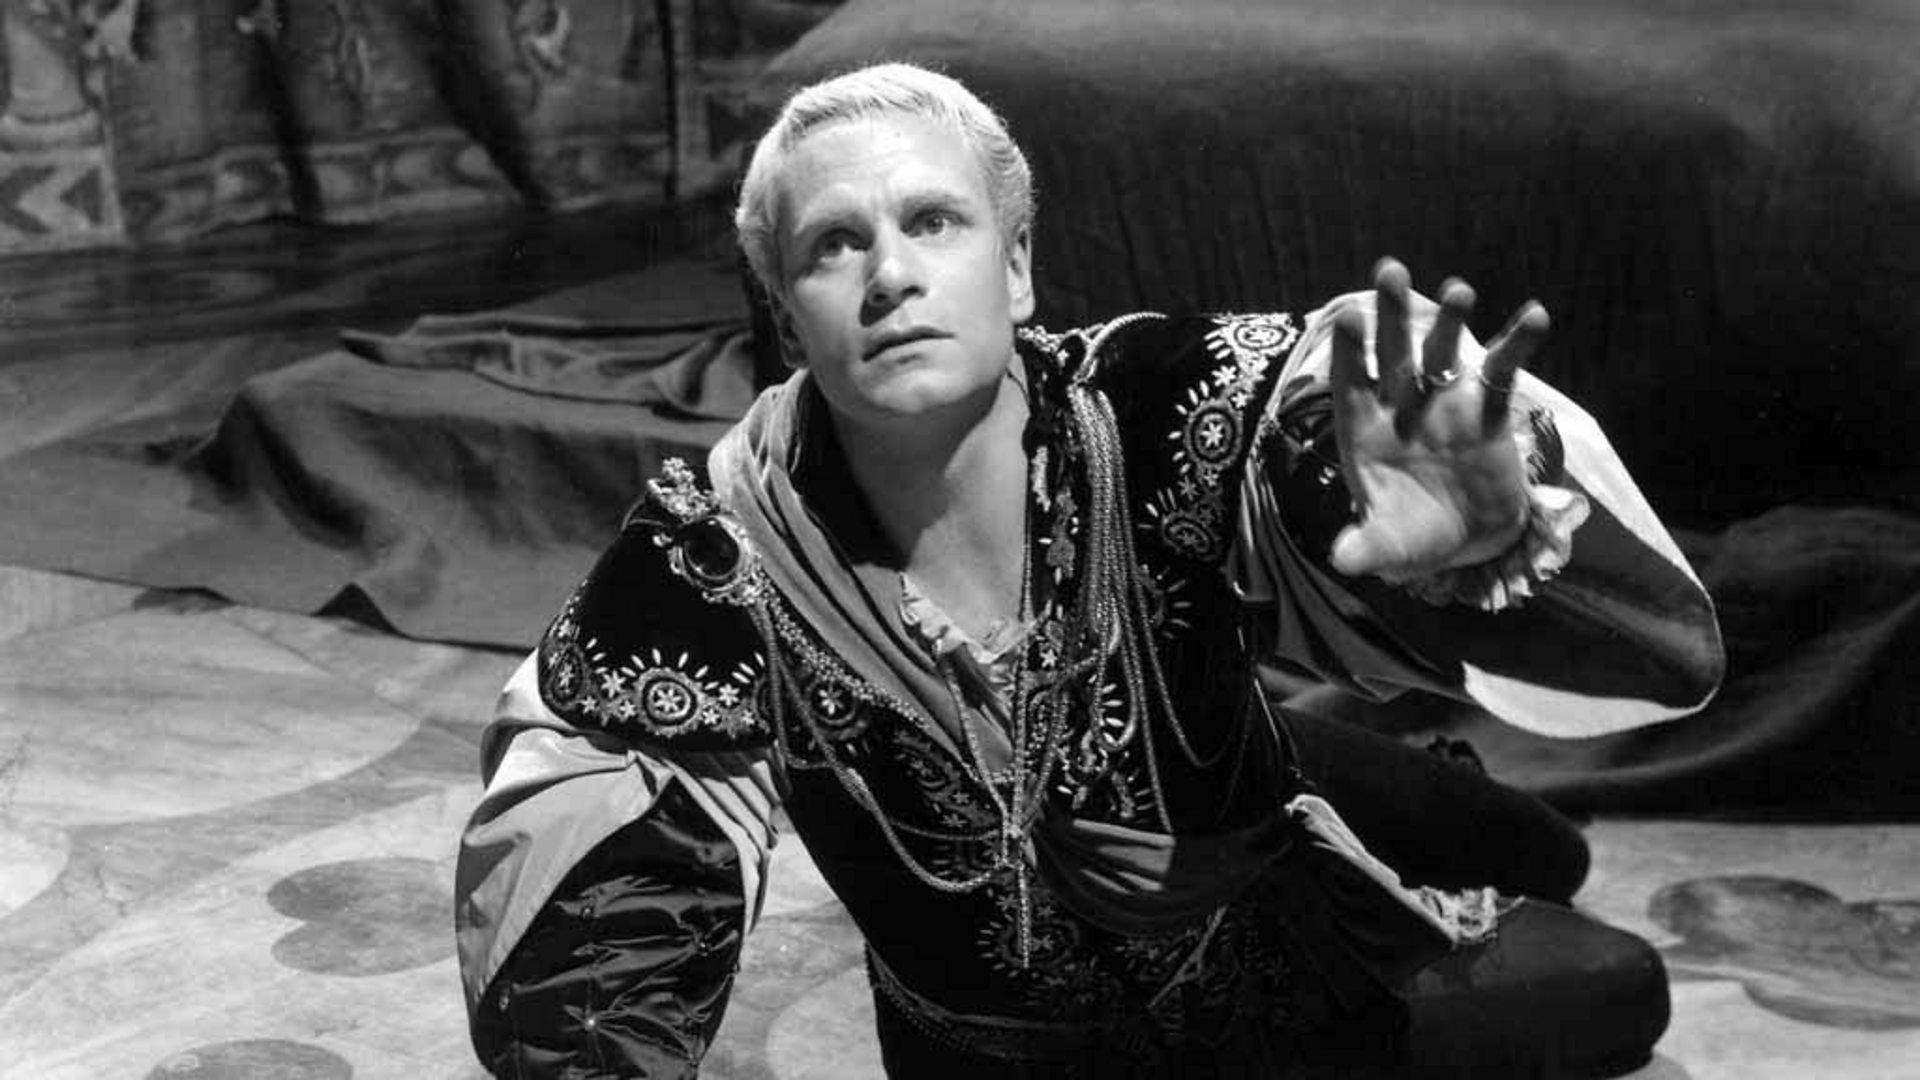 bbc history william shakespeare play shakespeare s work